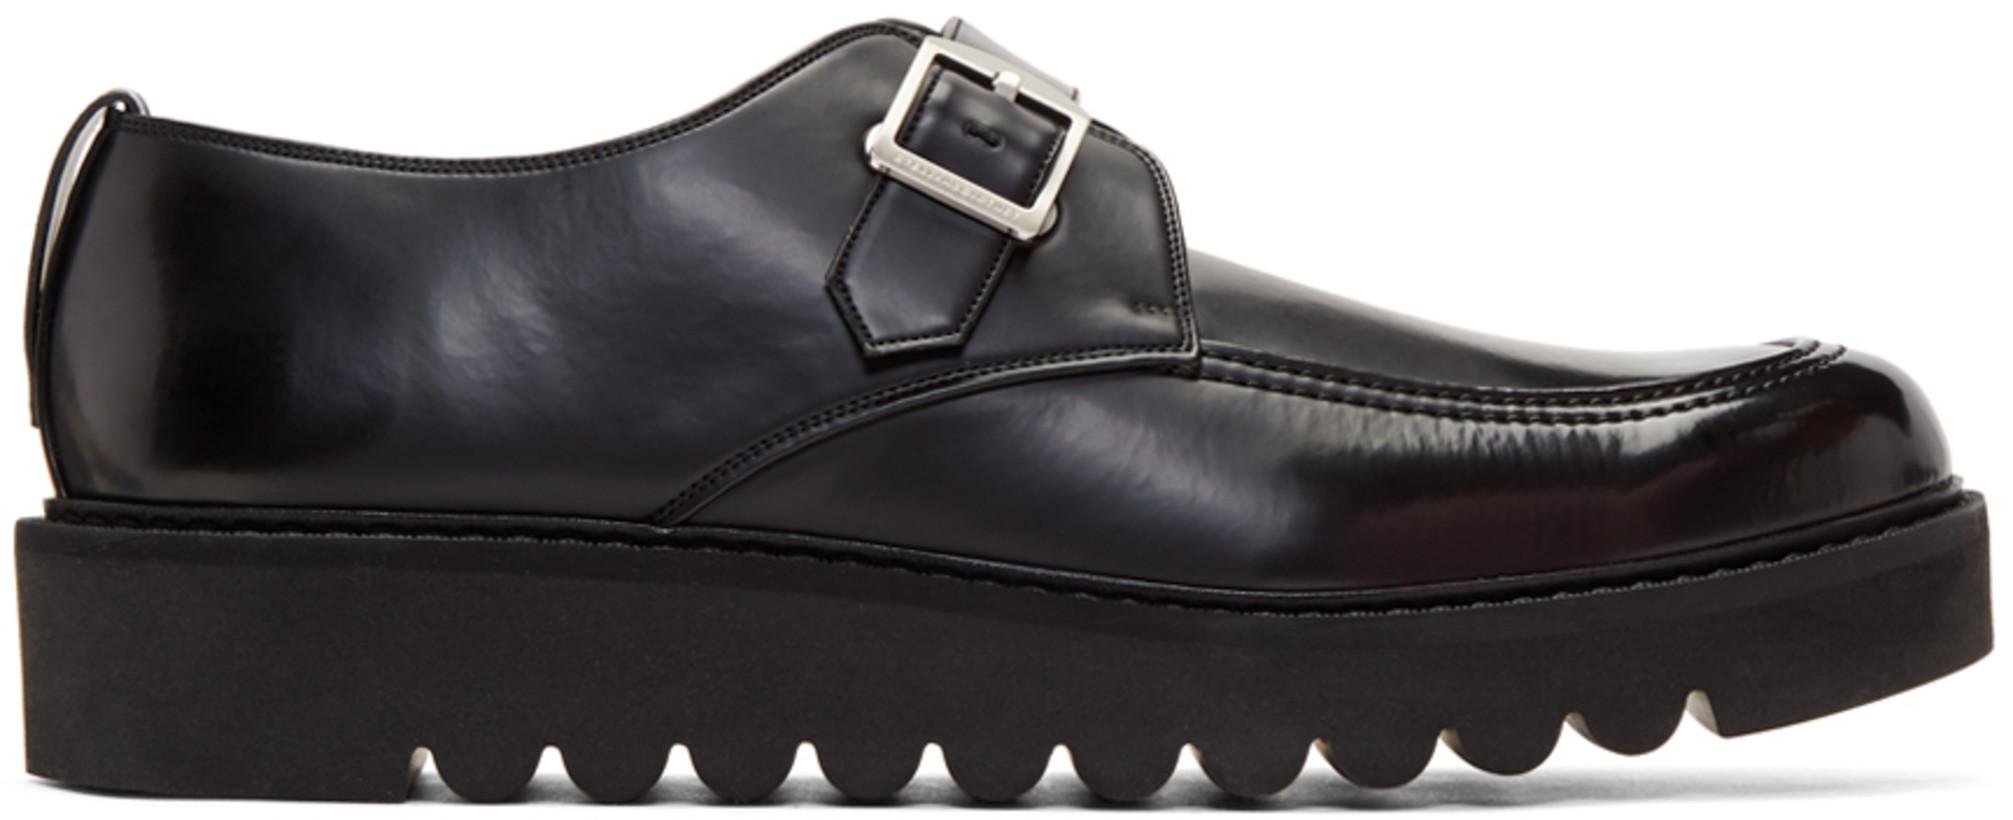 Stella McCartney Men's Black Odette Monkstrap Shoes